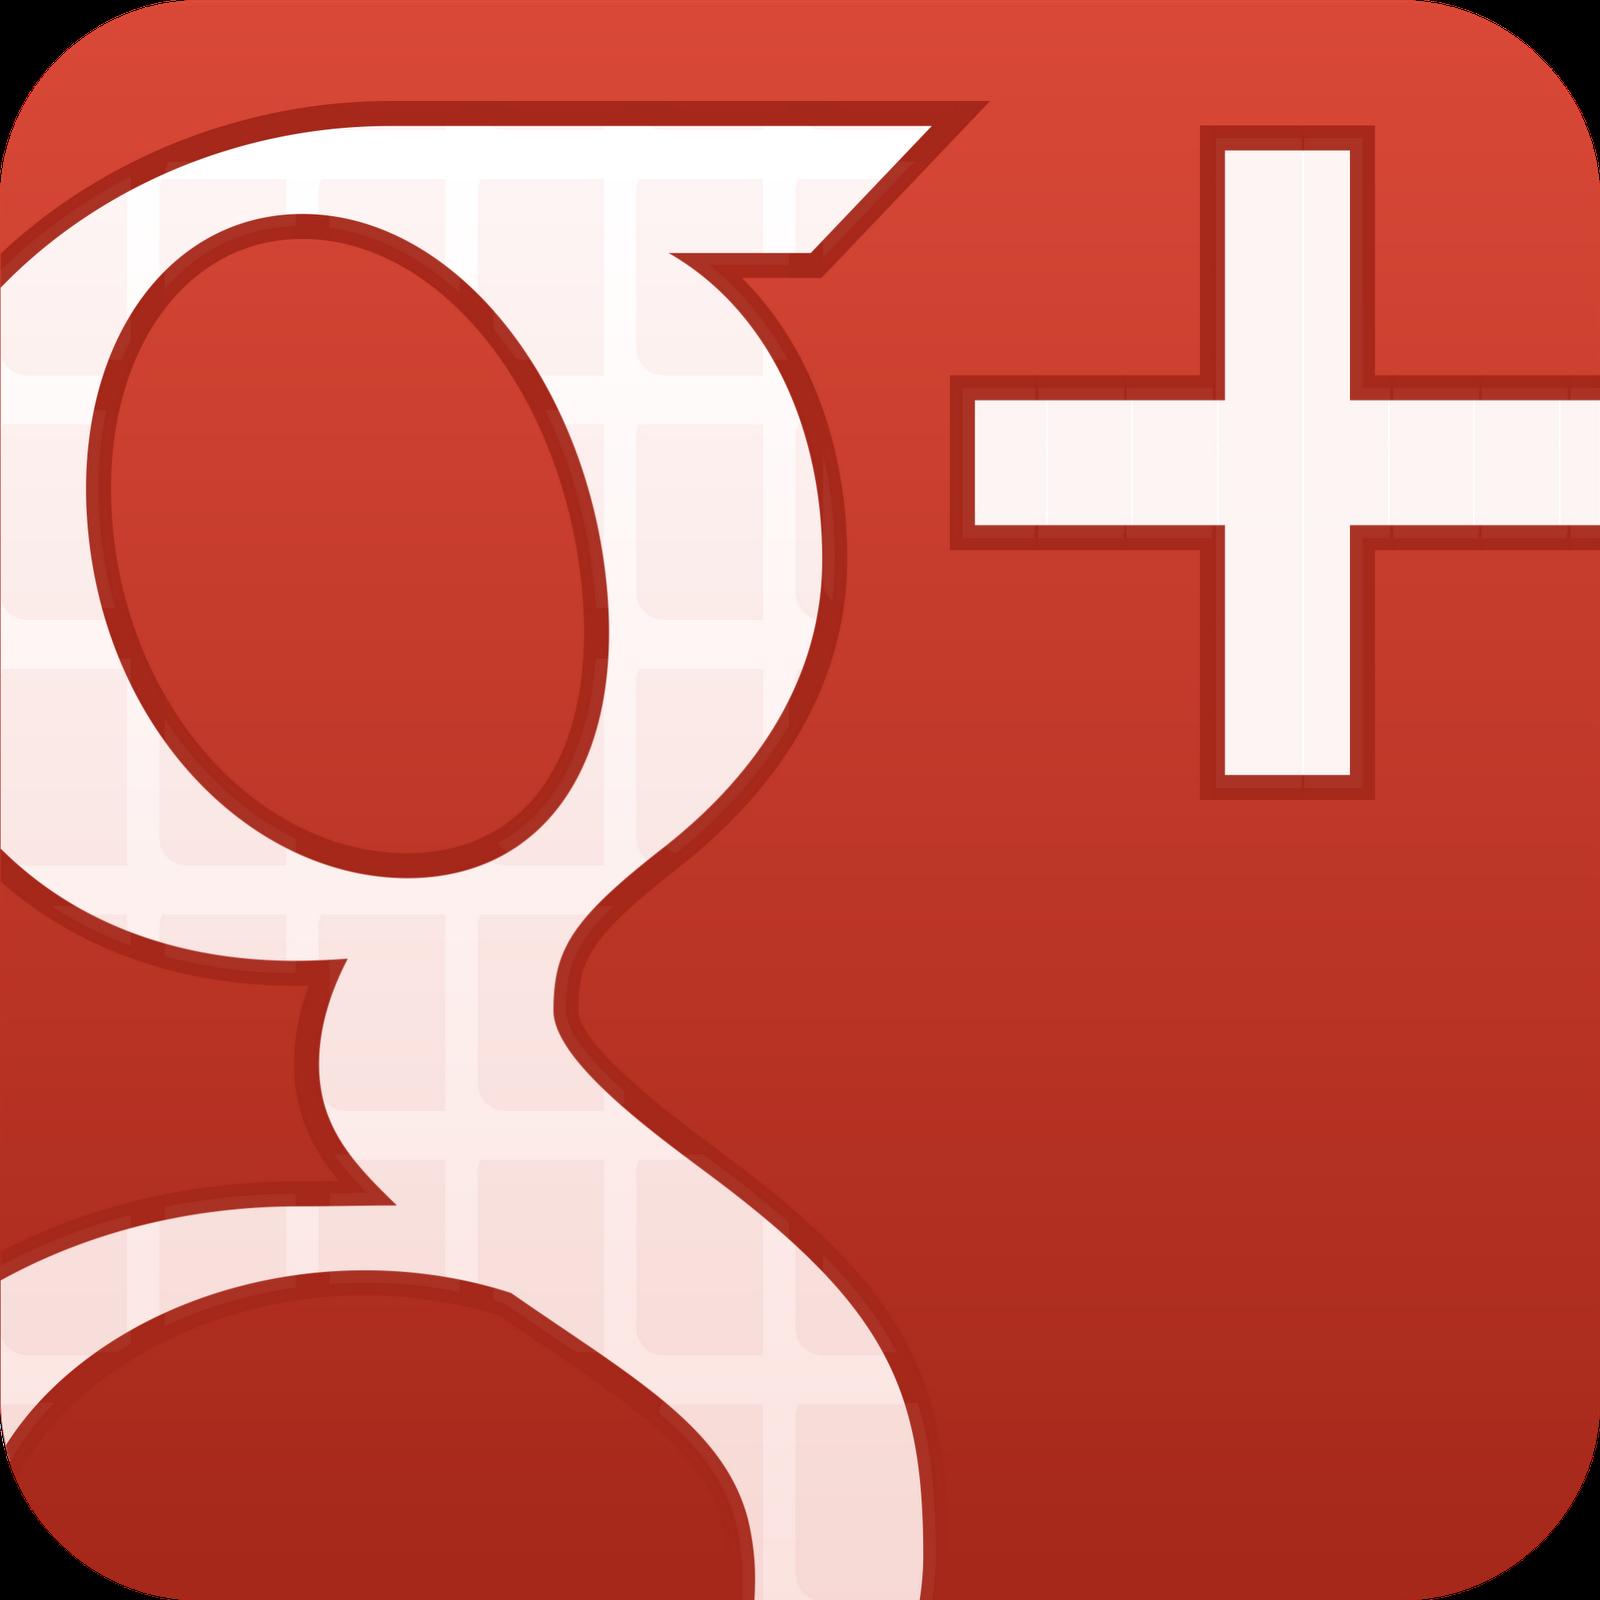 google plus logo image 1265